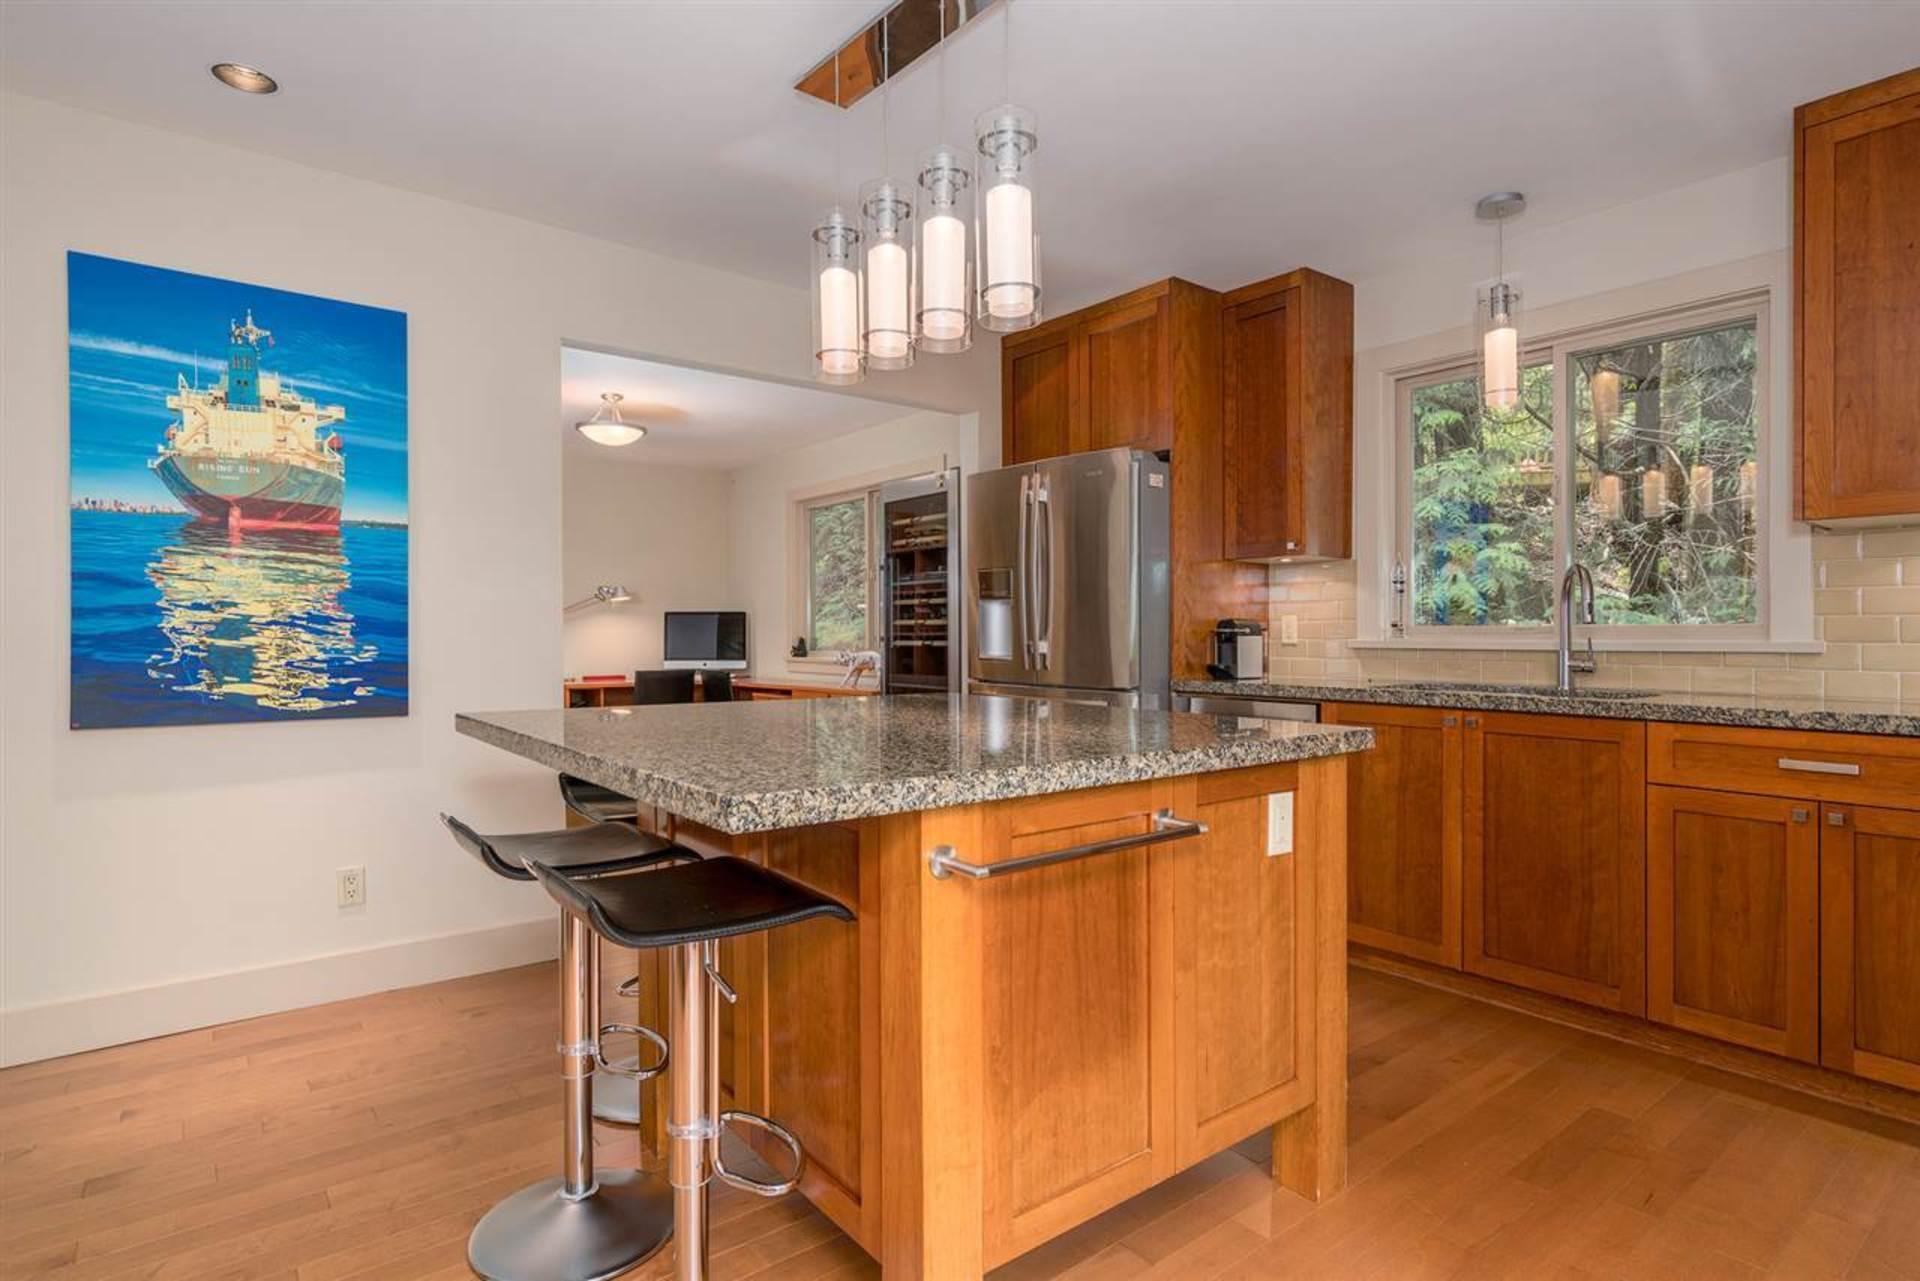 4620-woodburn-road-cypress-park-estates-west-vancouver-11 at 4620 Woodburn Road, Cypress Park Estates, West Vancouver